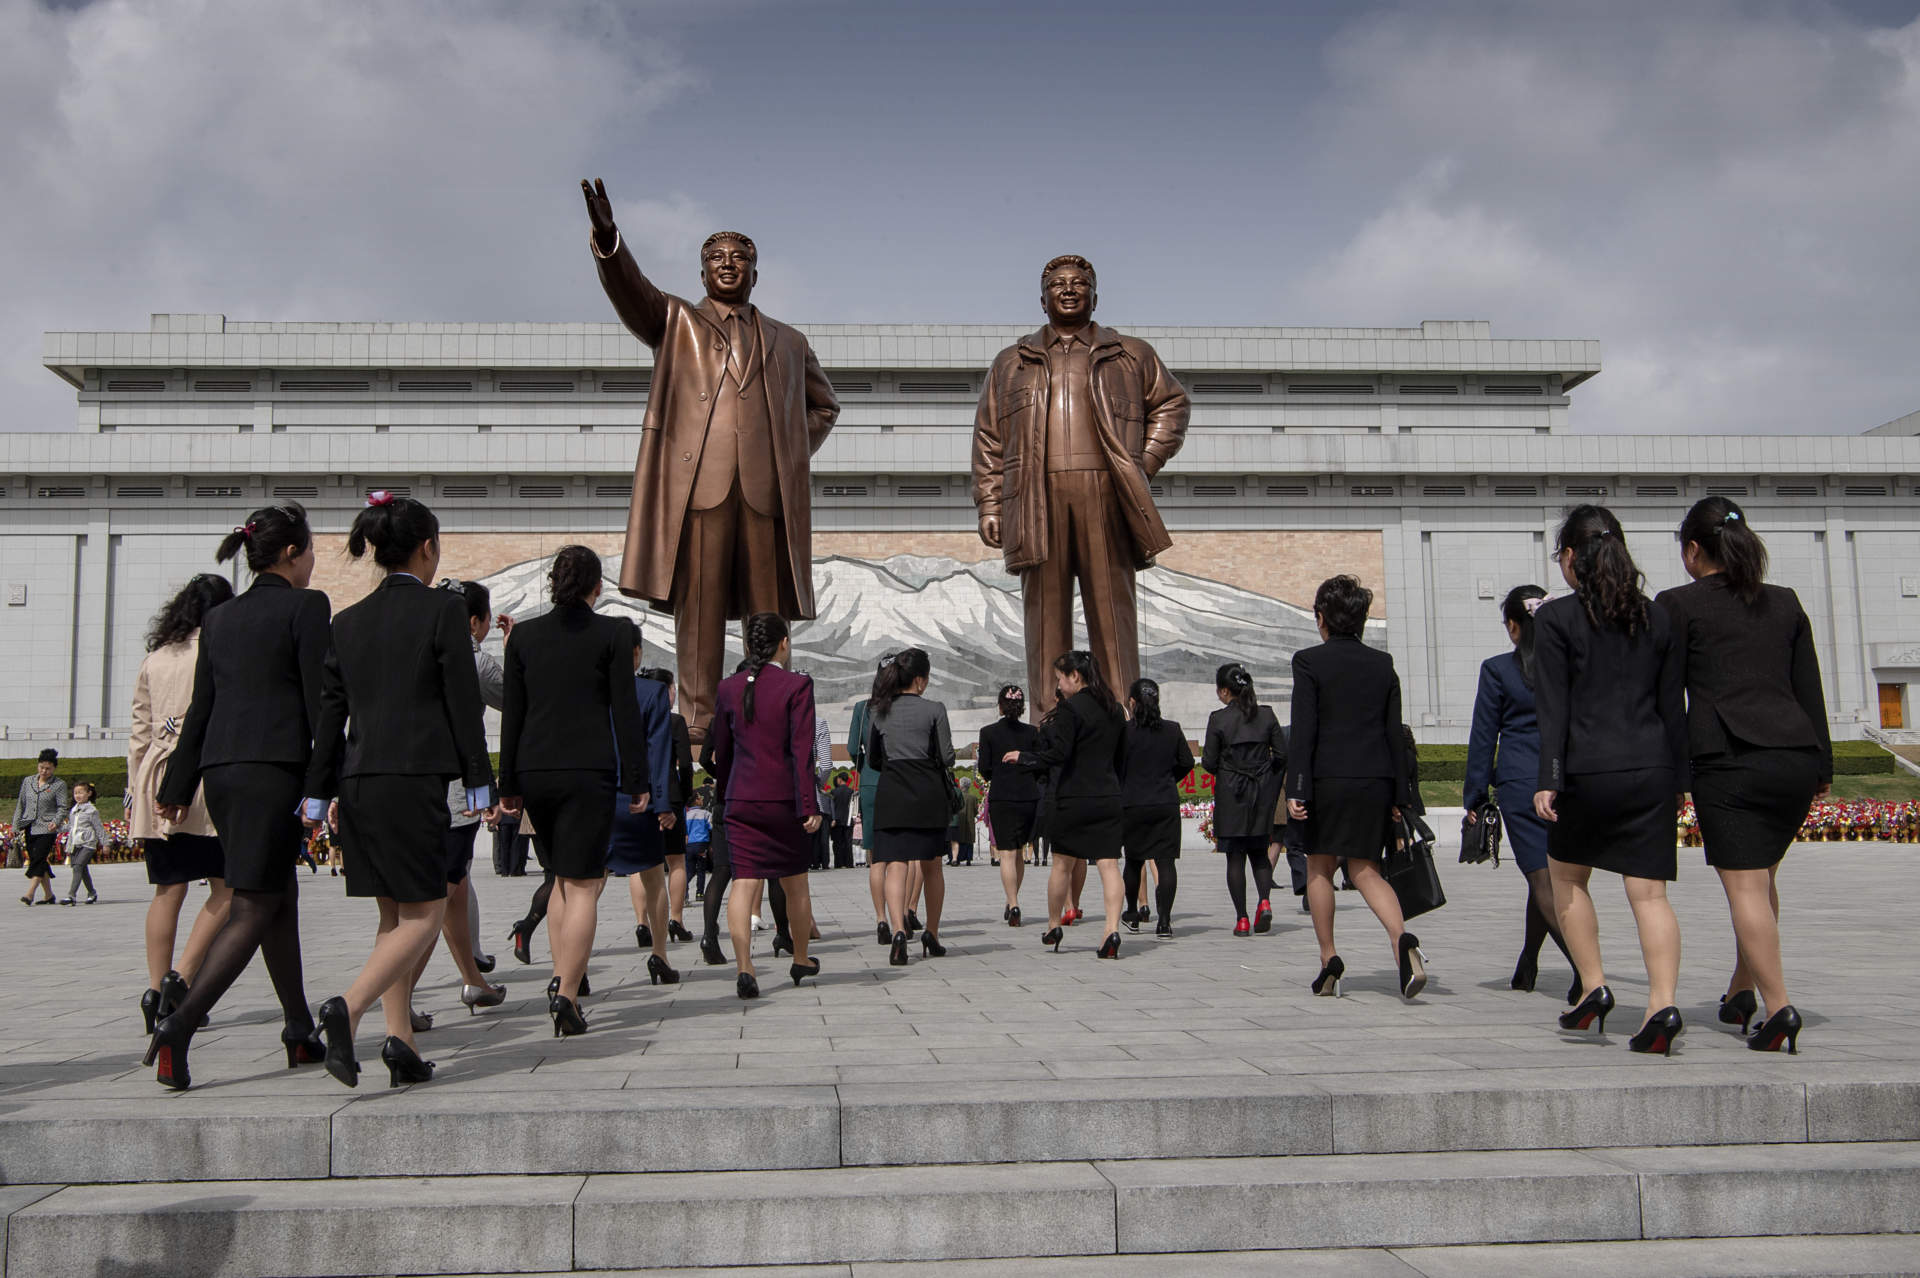 Nordkorea. (DPRK) Pyongyang. Firandet av Kim Il Sungs 106e födelsedag. Kim Il Sung square.